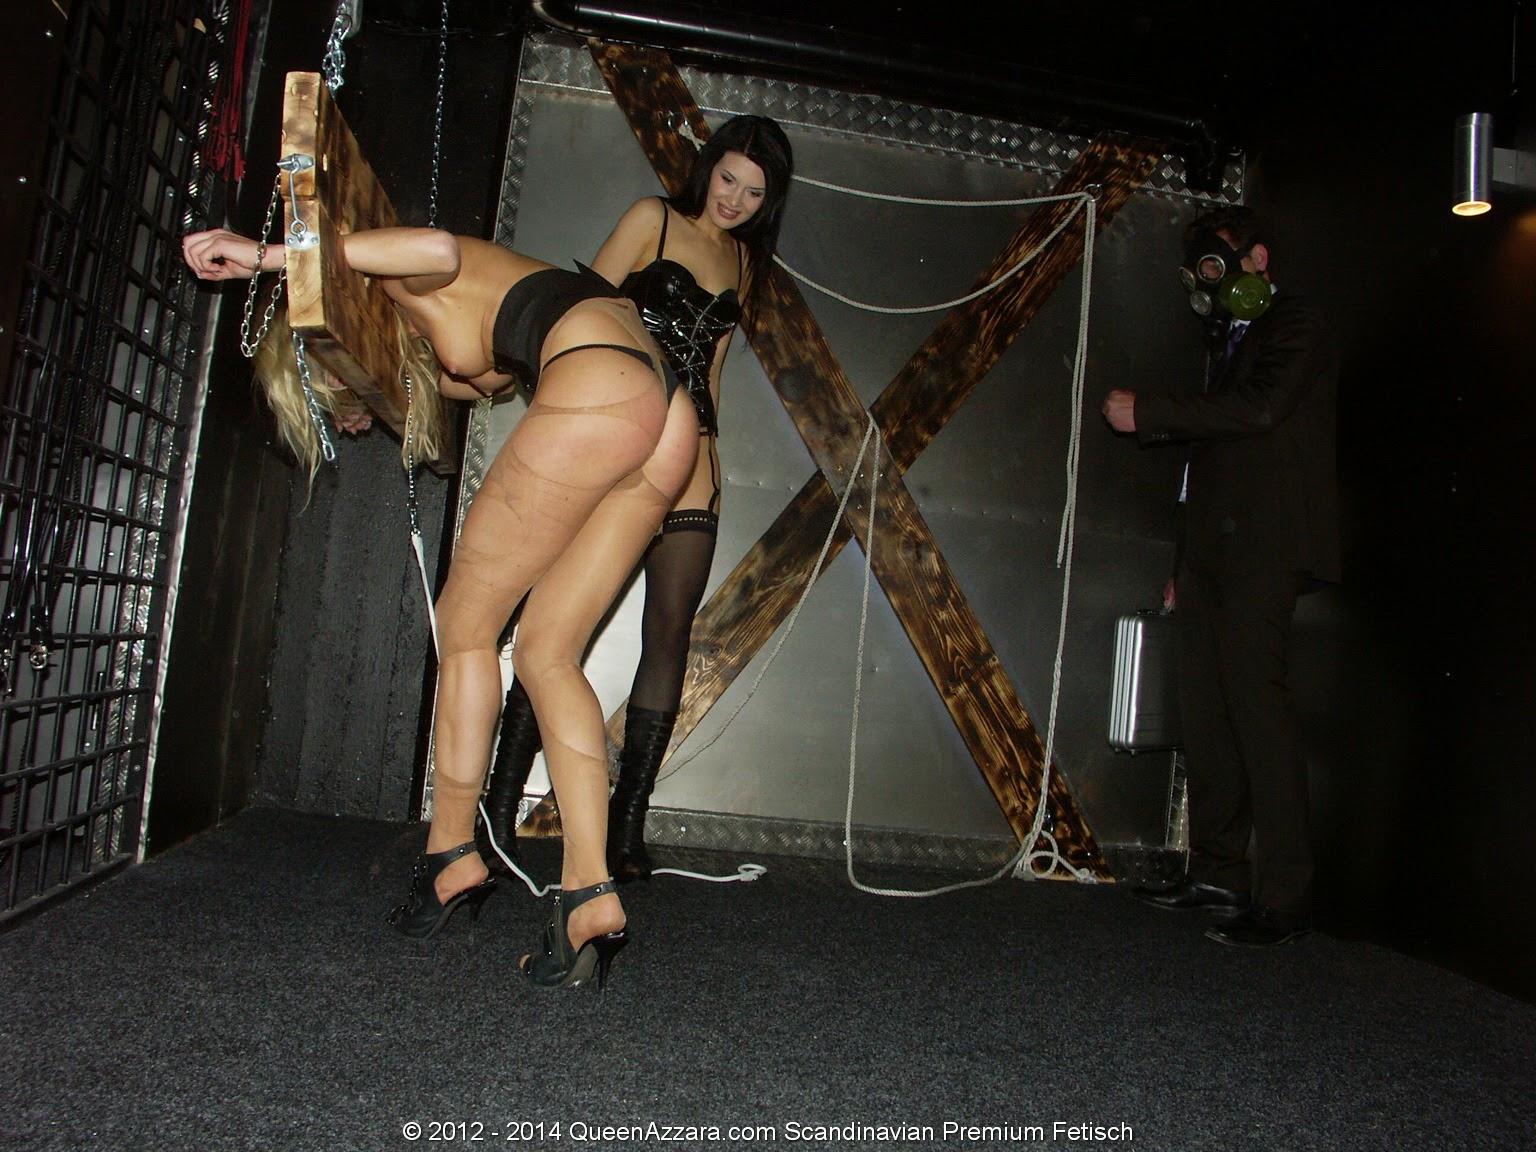 sweden escort service tights dame